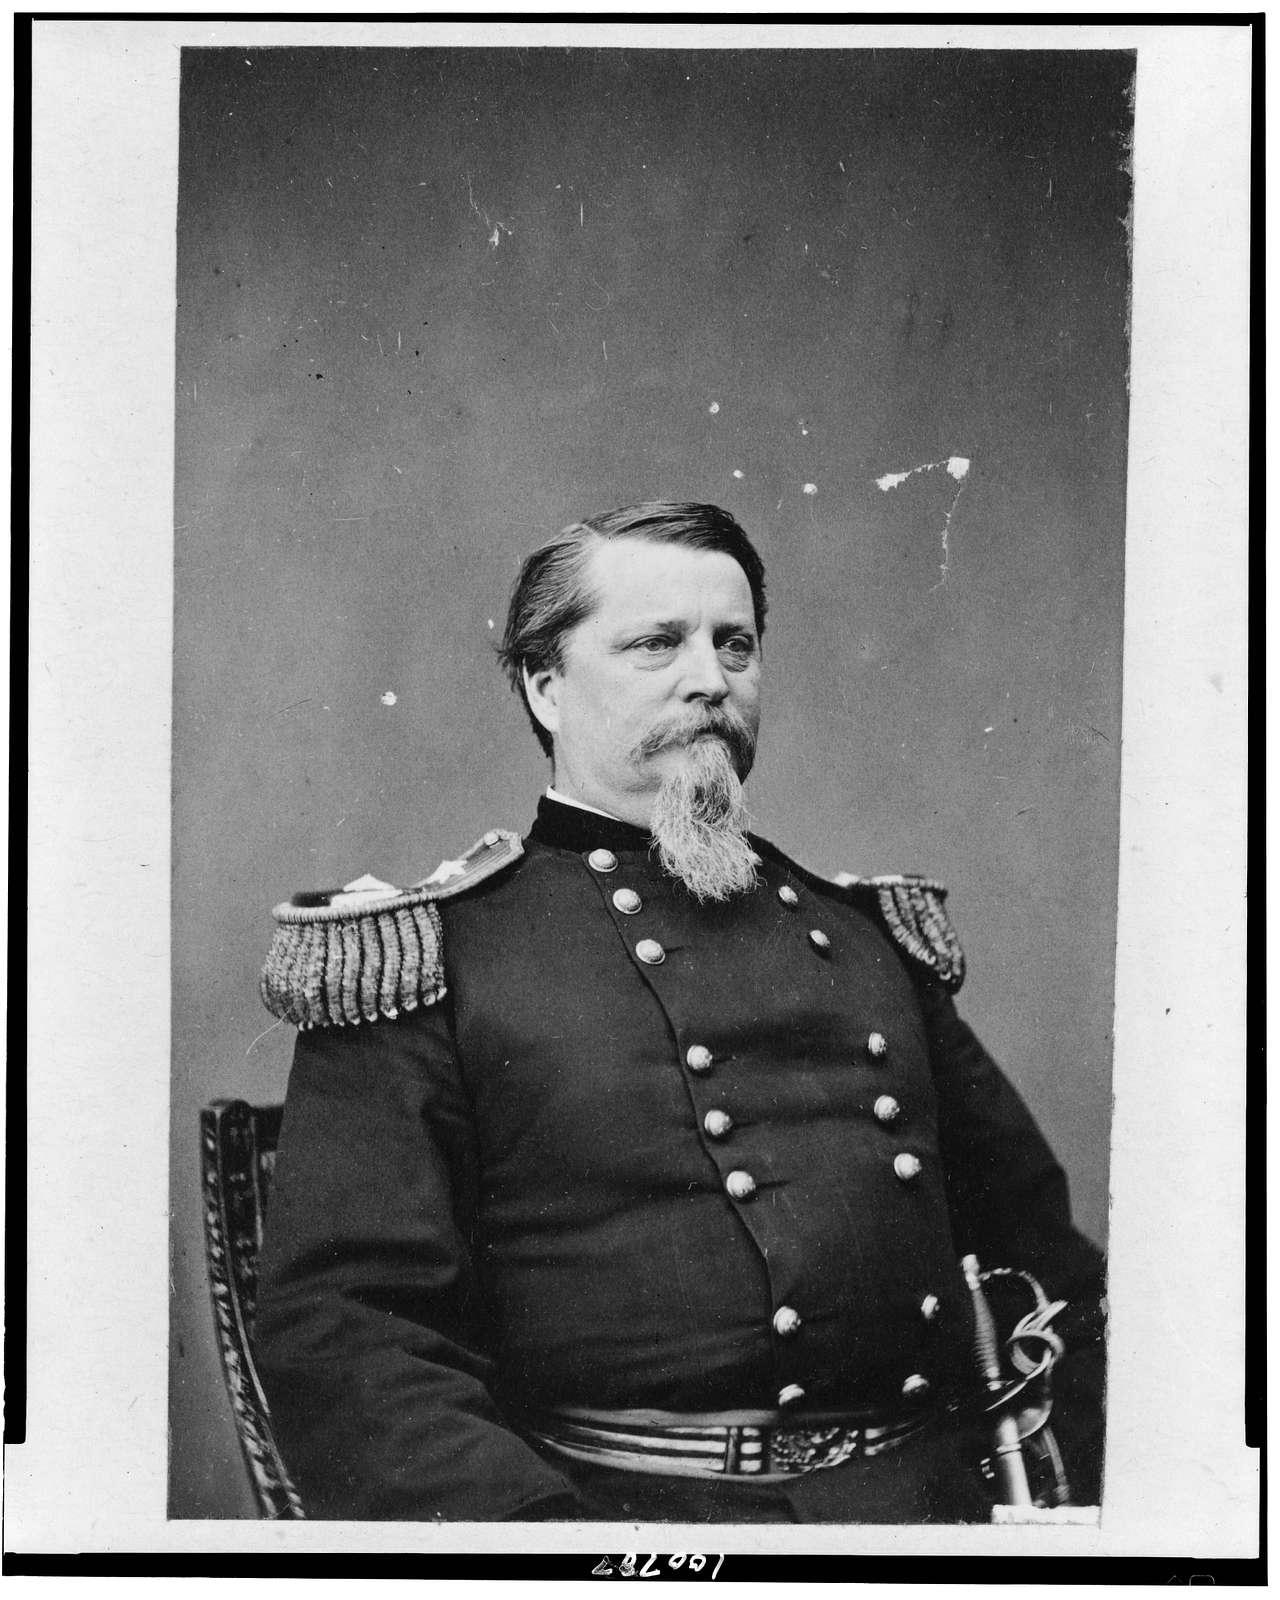 [Union general Winfield Scott Hancock, half-length portrait, seated, facing right, in uniform]